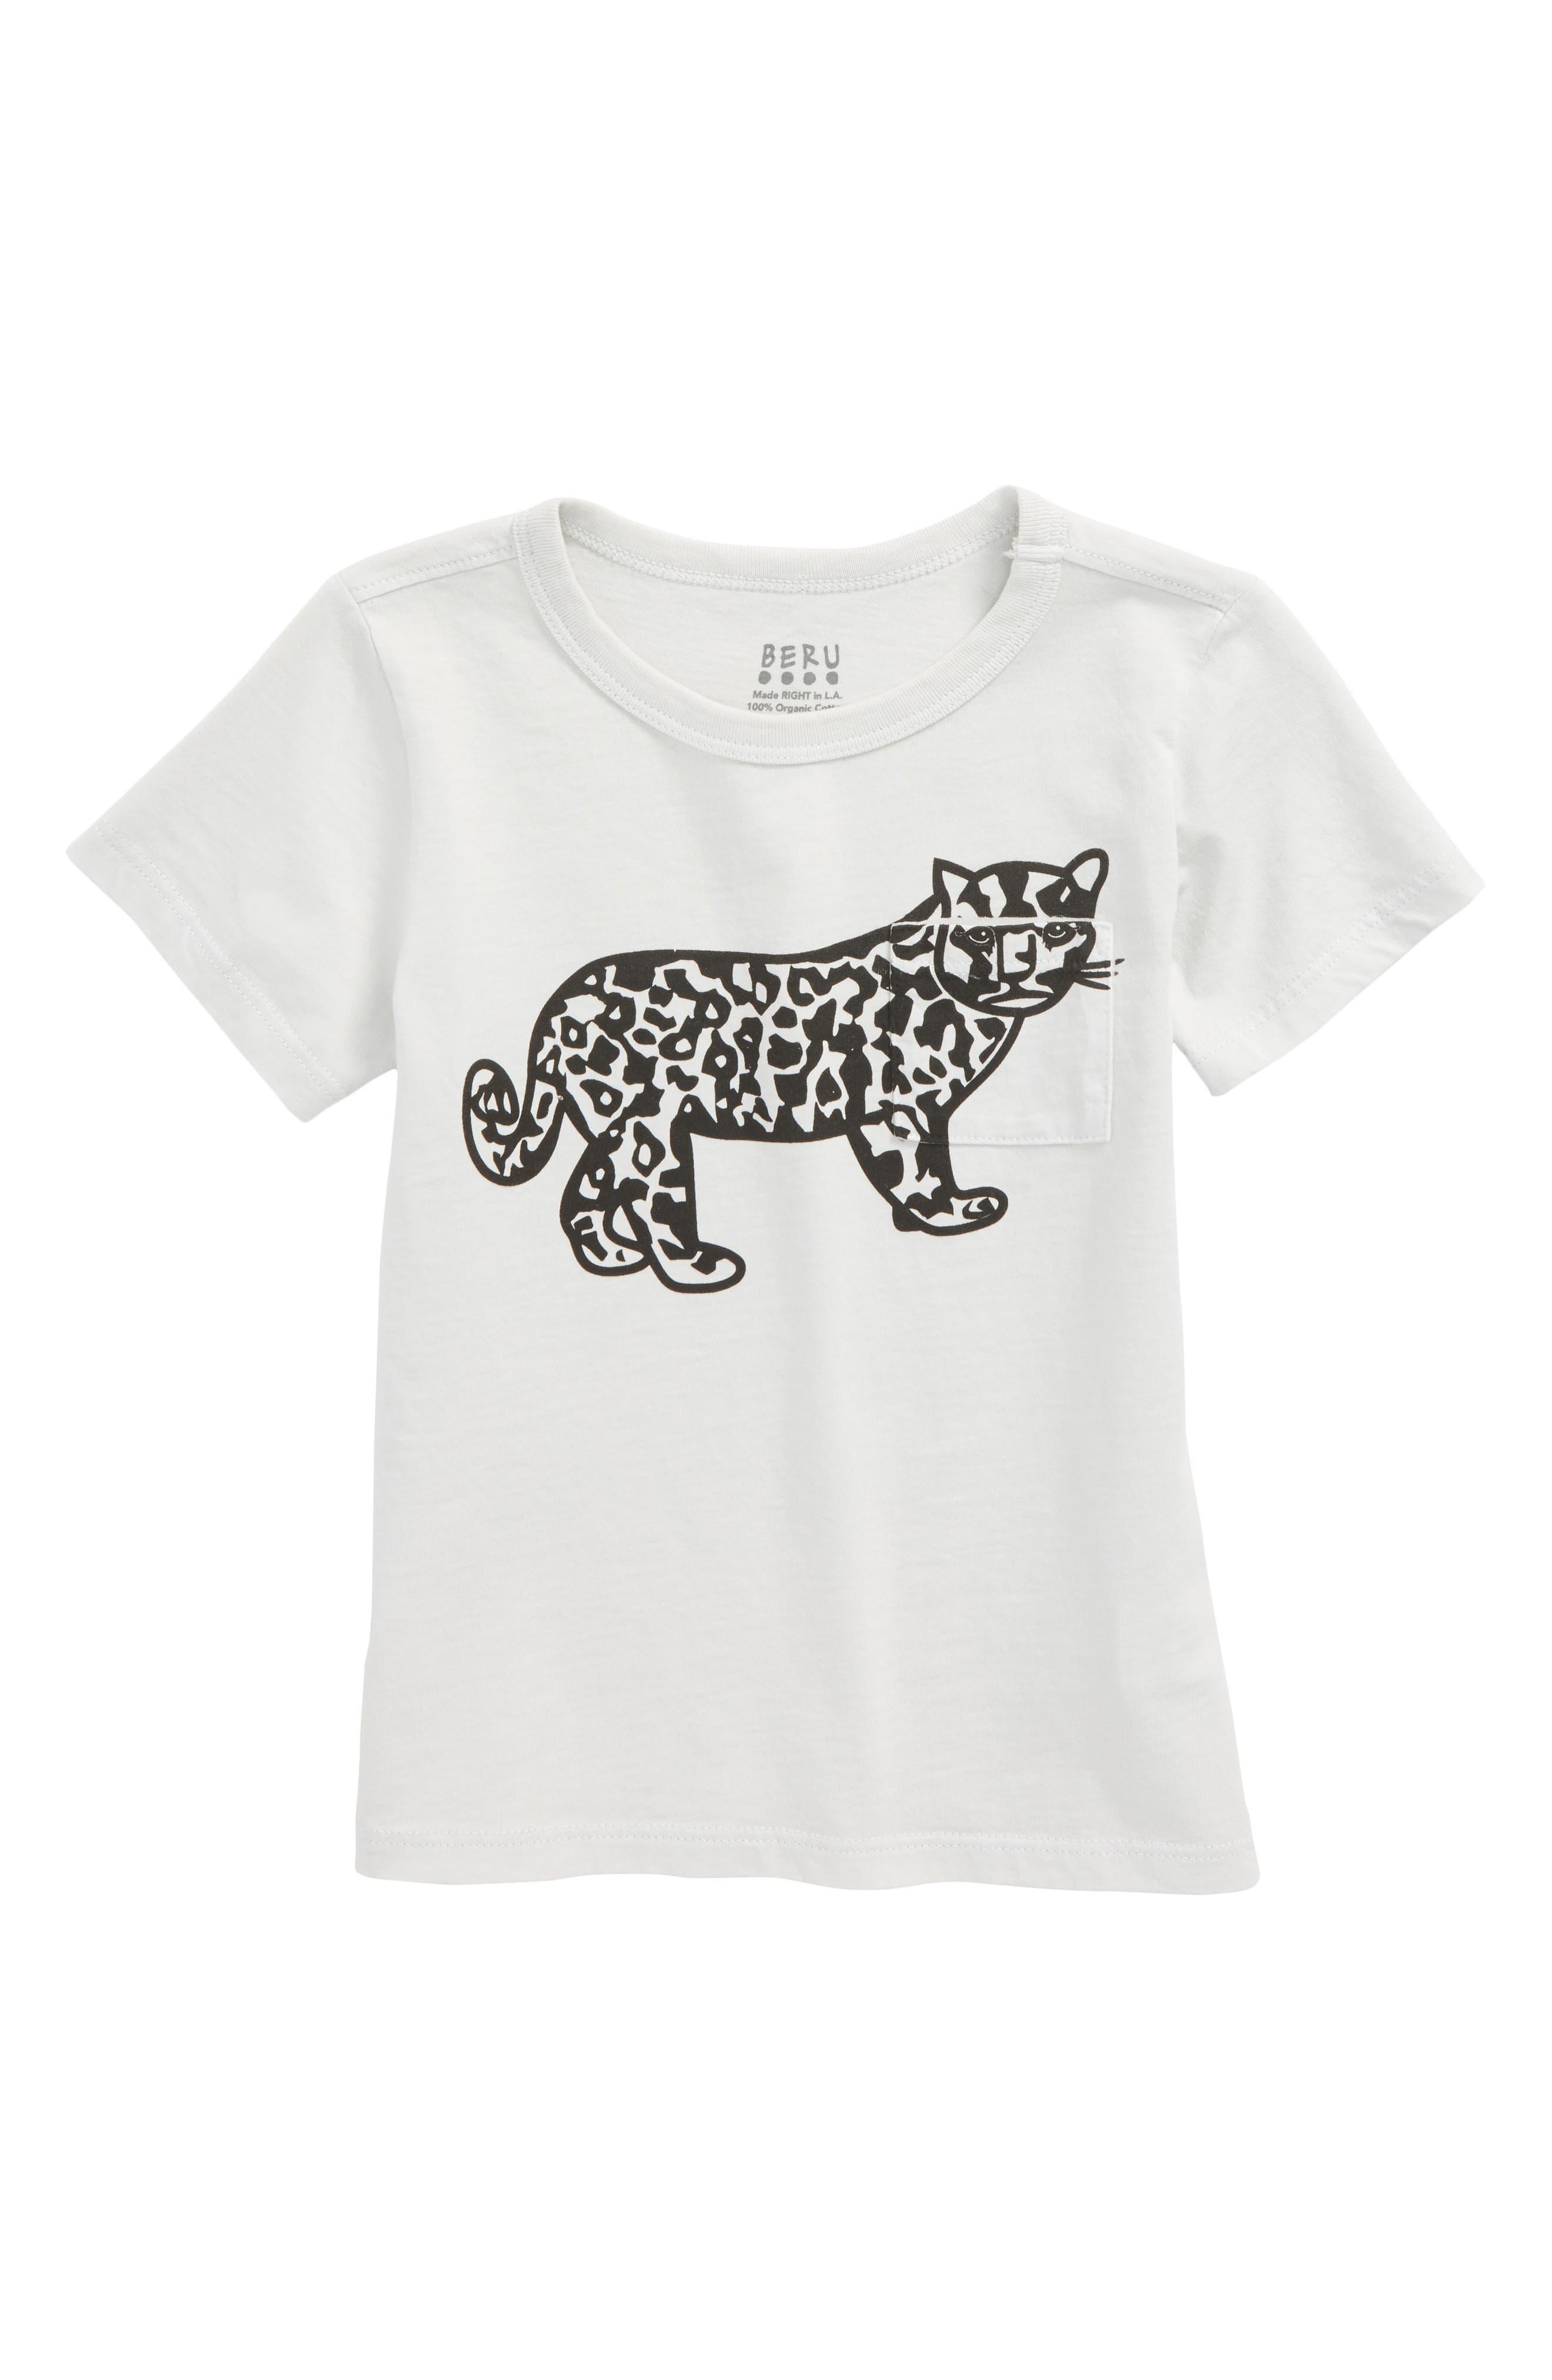 Huxley Leopard Graphic Organic Cotton T-Shirt,                             Main thumbnail 1, color,                             100